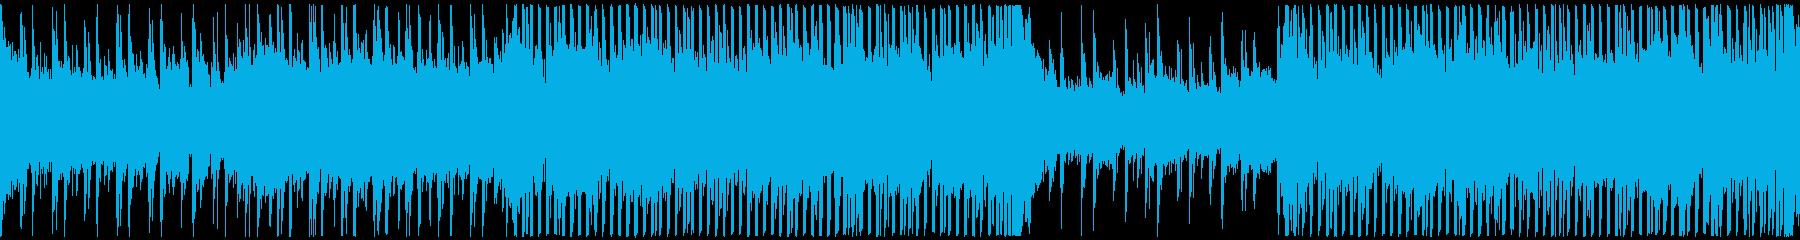 VP系4、イベント、爽やか、高揚感Cの再生済みの波形